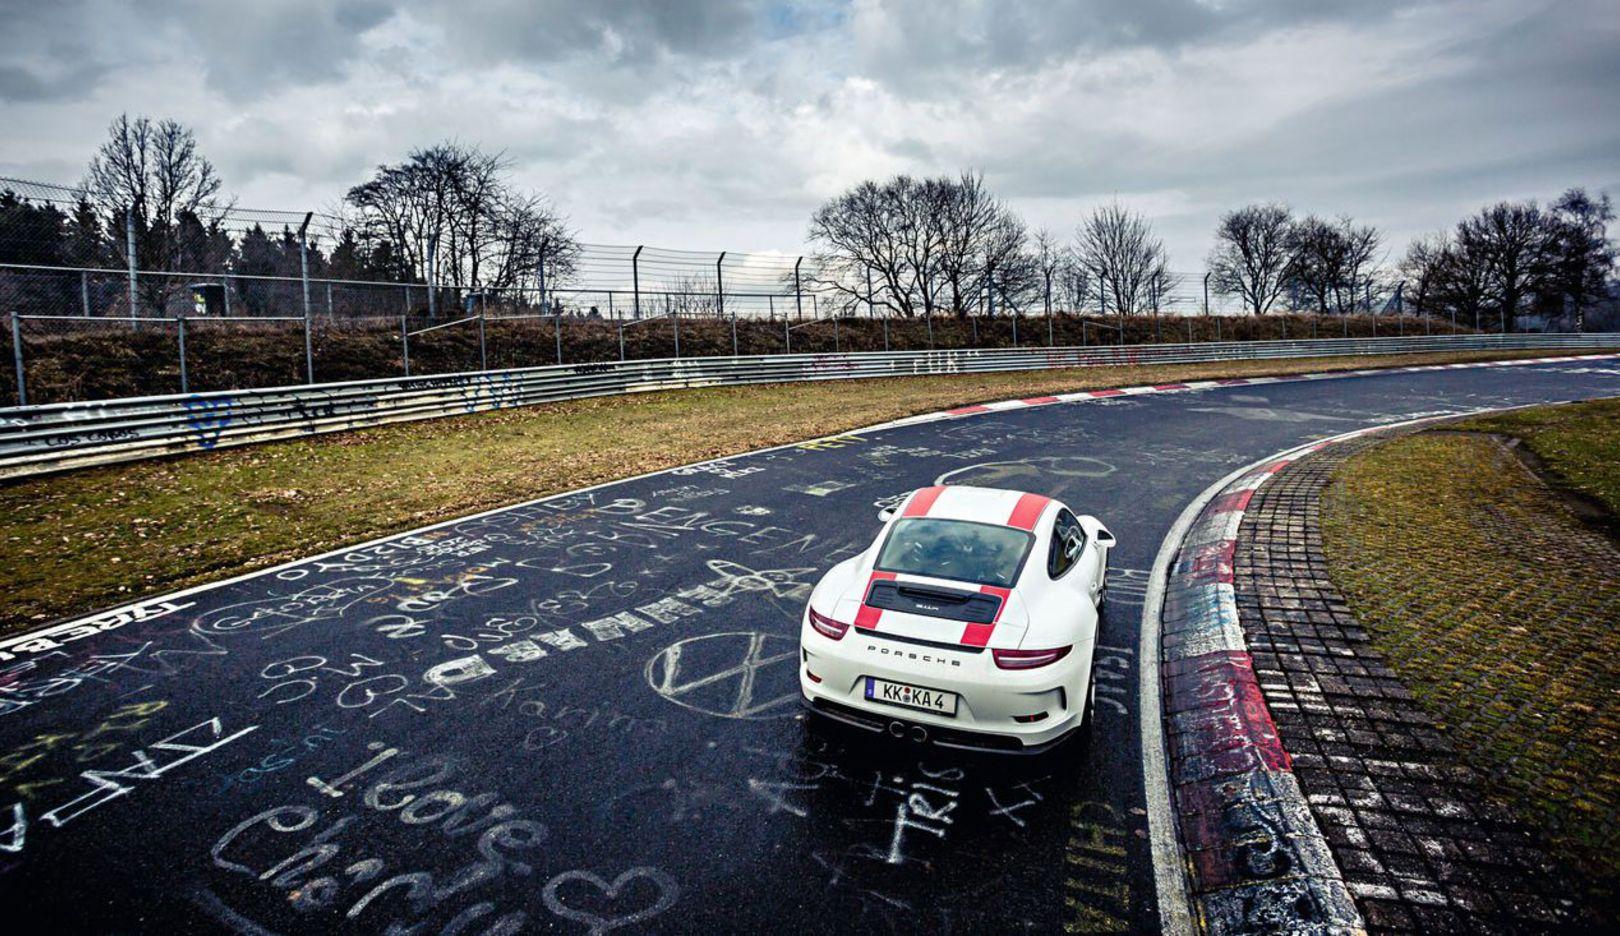 The Nürburgring is their life - Image 2